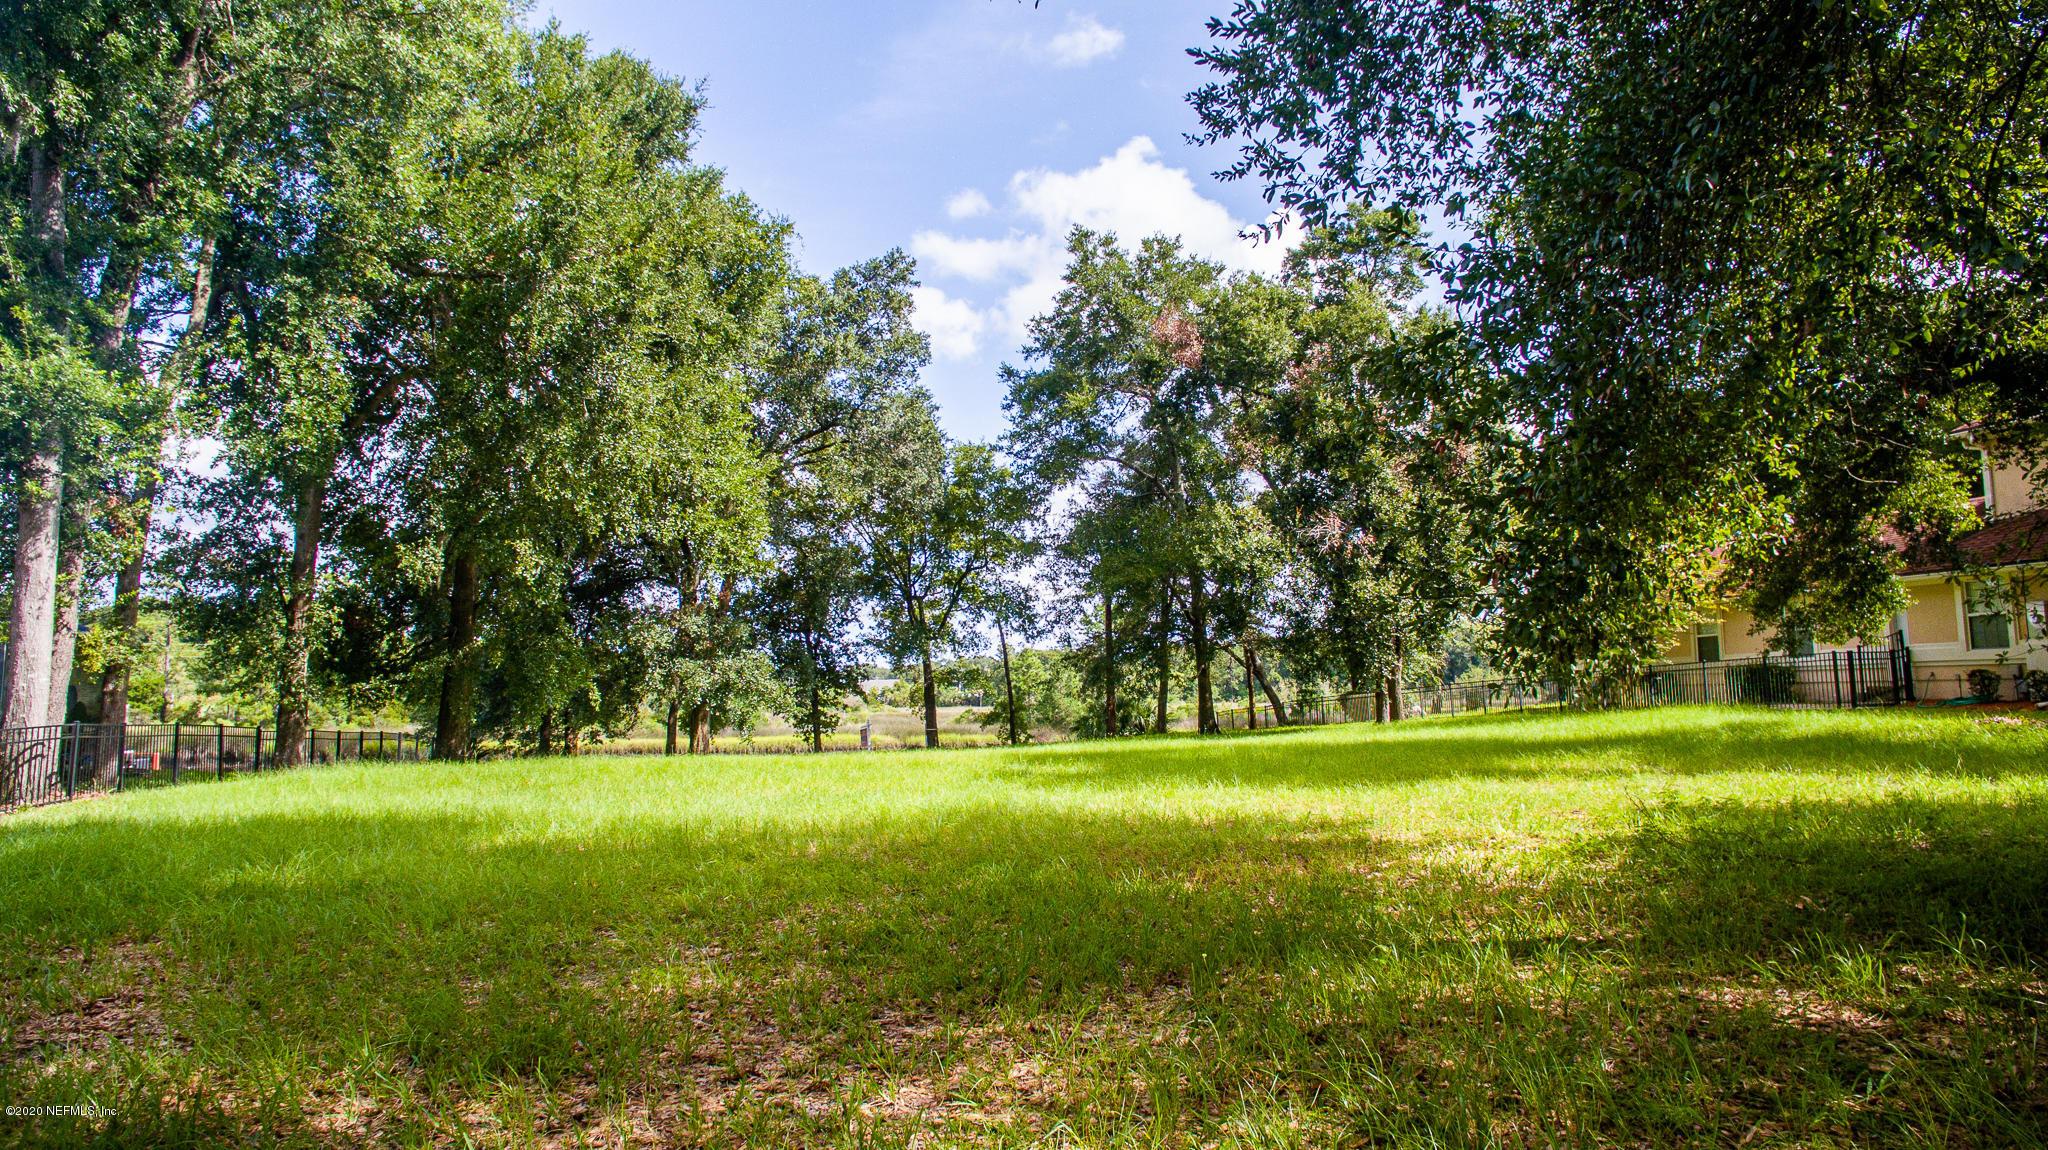 117 SCHOONER KEY, JACKSONVILLE, FLORIDA 32218, ,Vacant land,For sale,SCHOONER KEY,1052864